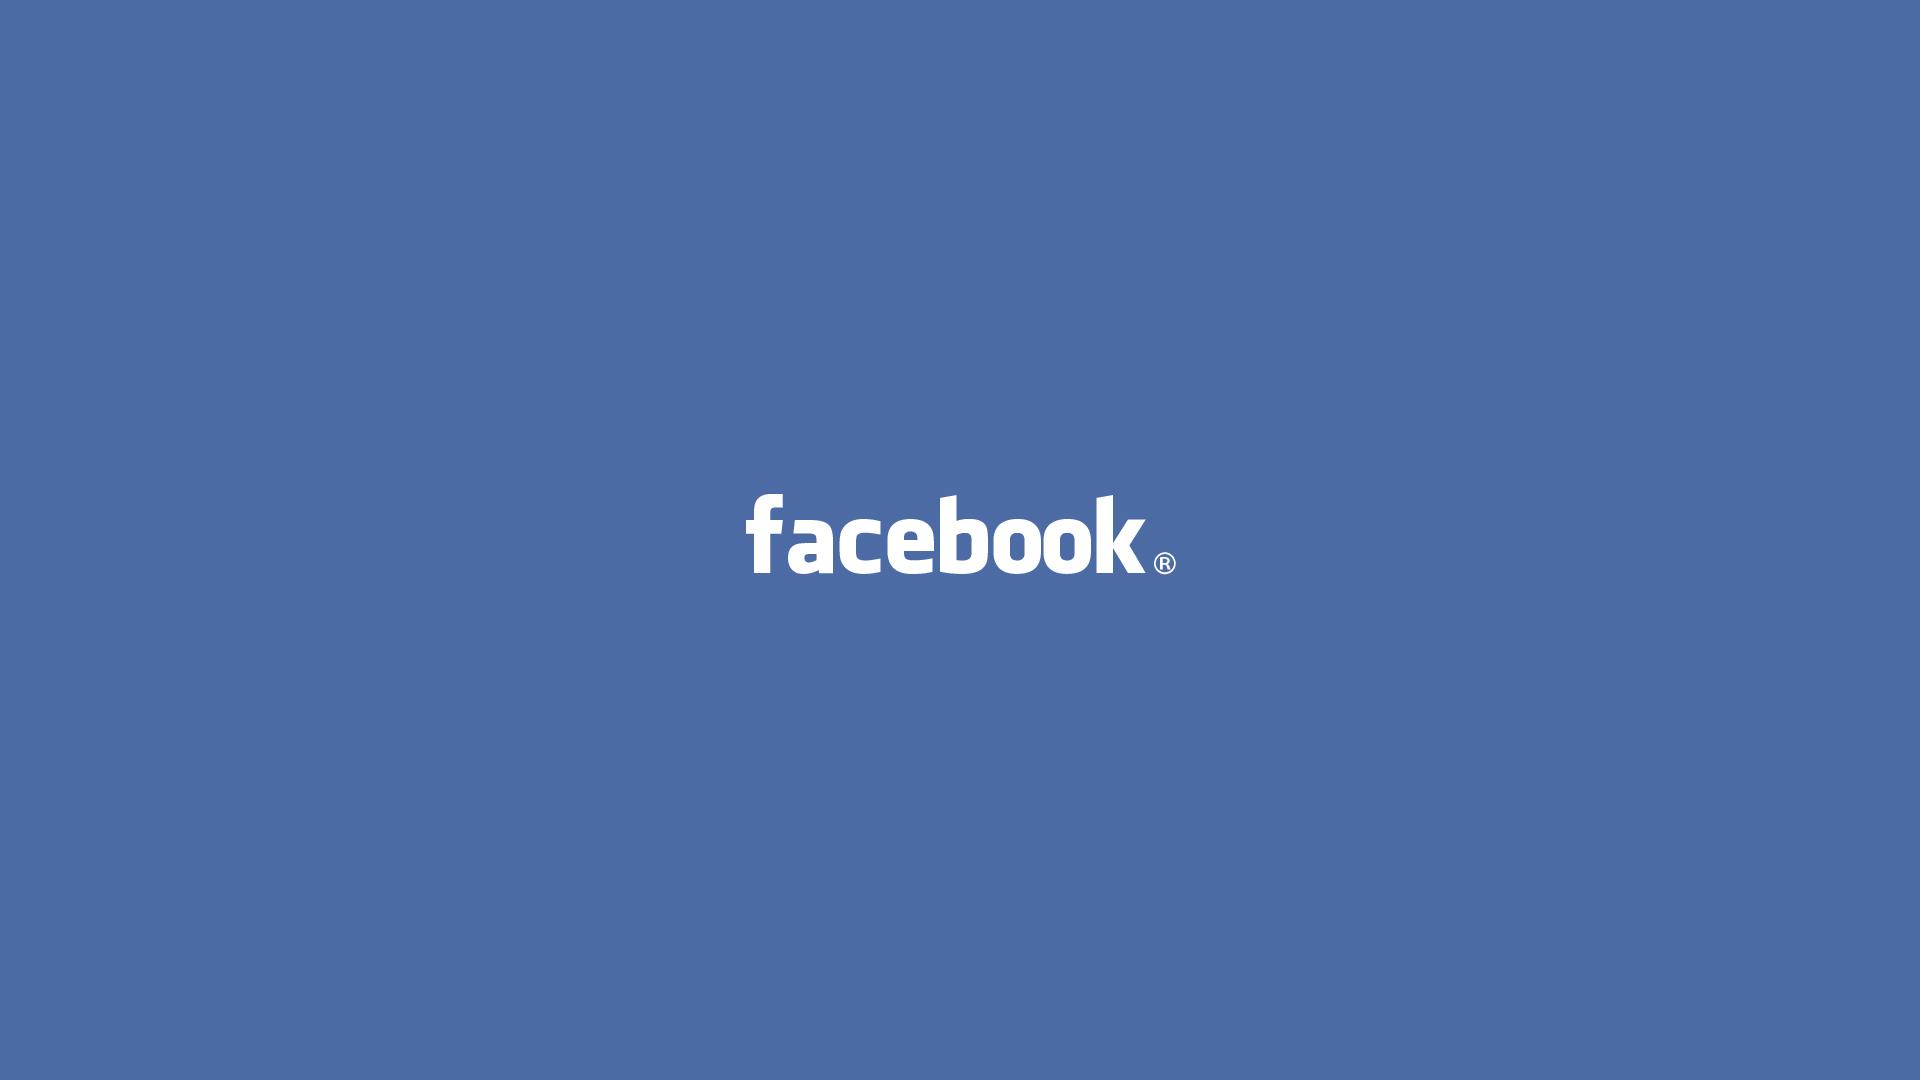 timeline para facebook wallpaper 1113398